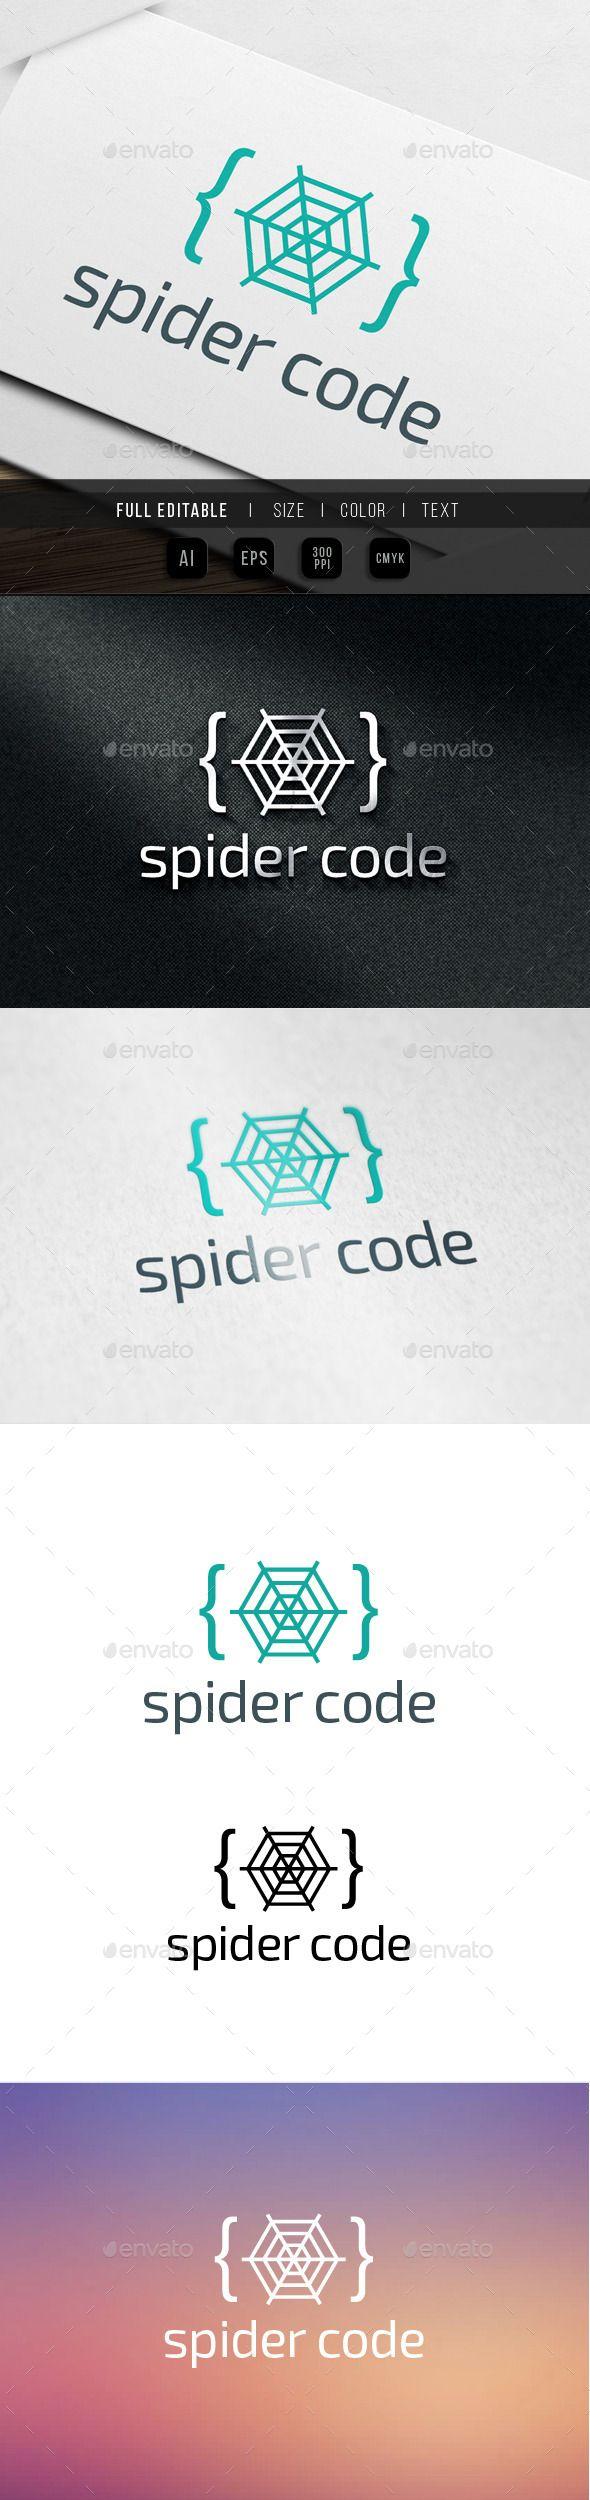 Spider Code Logo — Vector EPS #virus #html • Available here → https://graphicriver.net/item/spider-code-logo/9915470?ref=pxcr